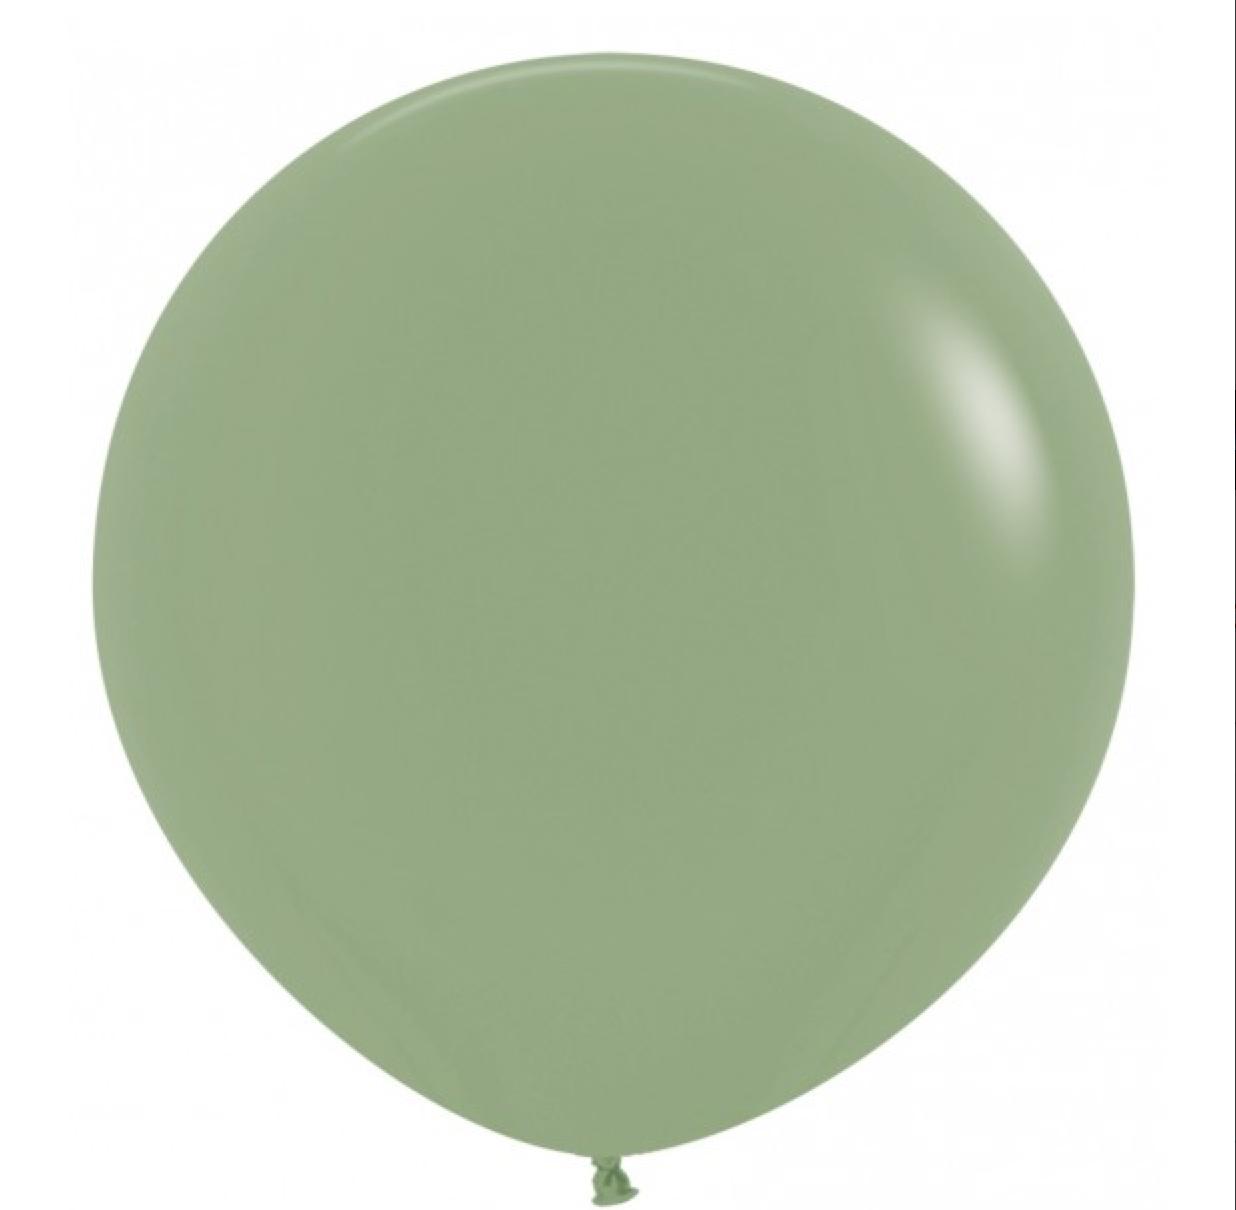 HH 1 round latex balloon eucalyptus 60 cm